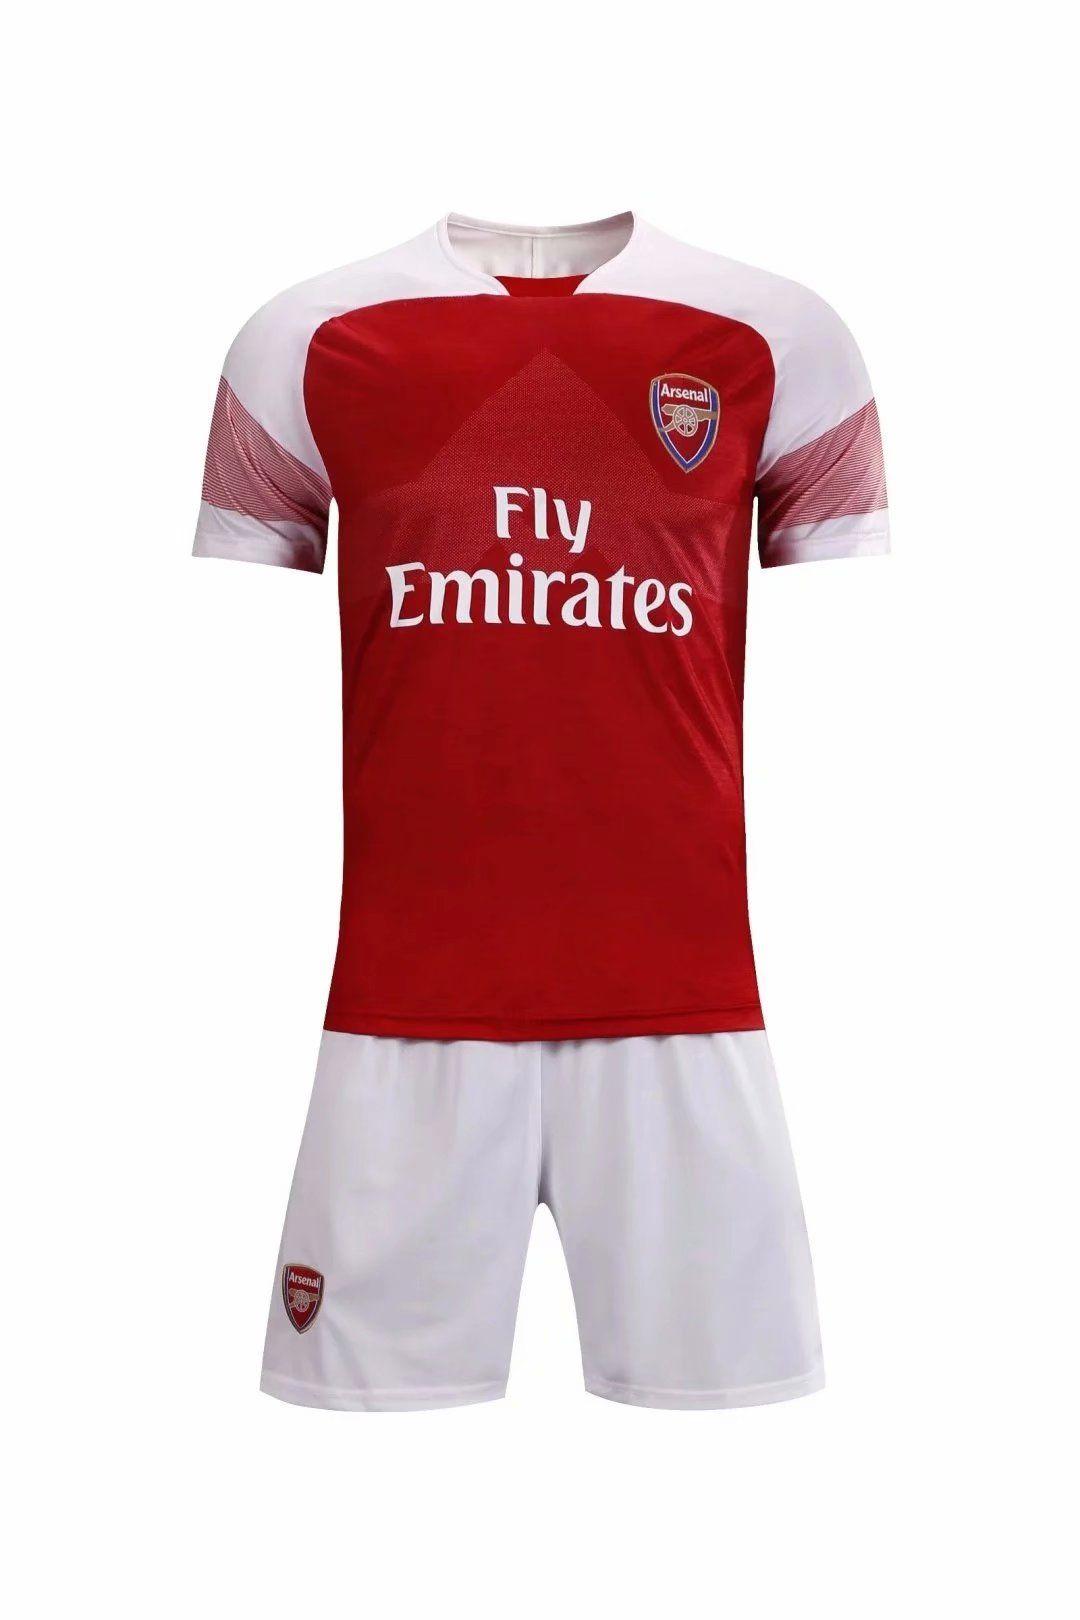 342f06971dc54 18/19 Kids Arsenal Home Without Brand Logo Soccer Uniforms Children  Football Kits